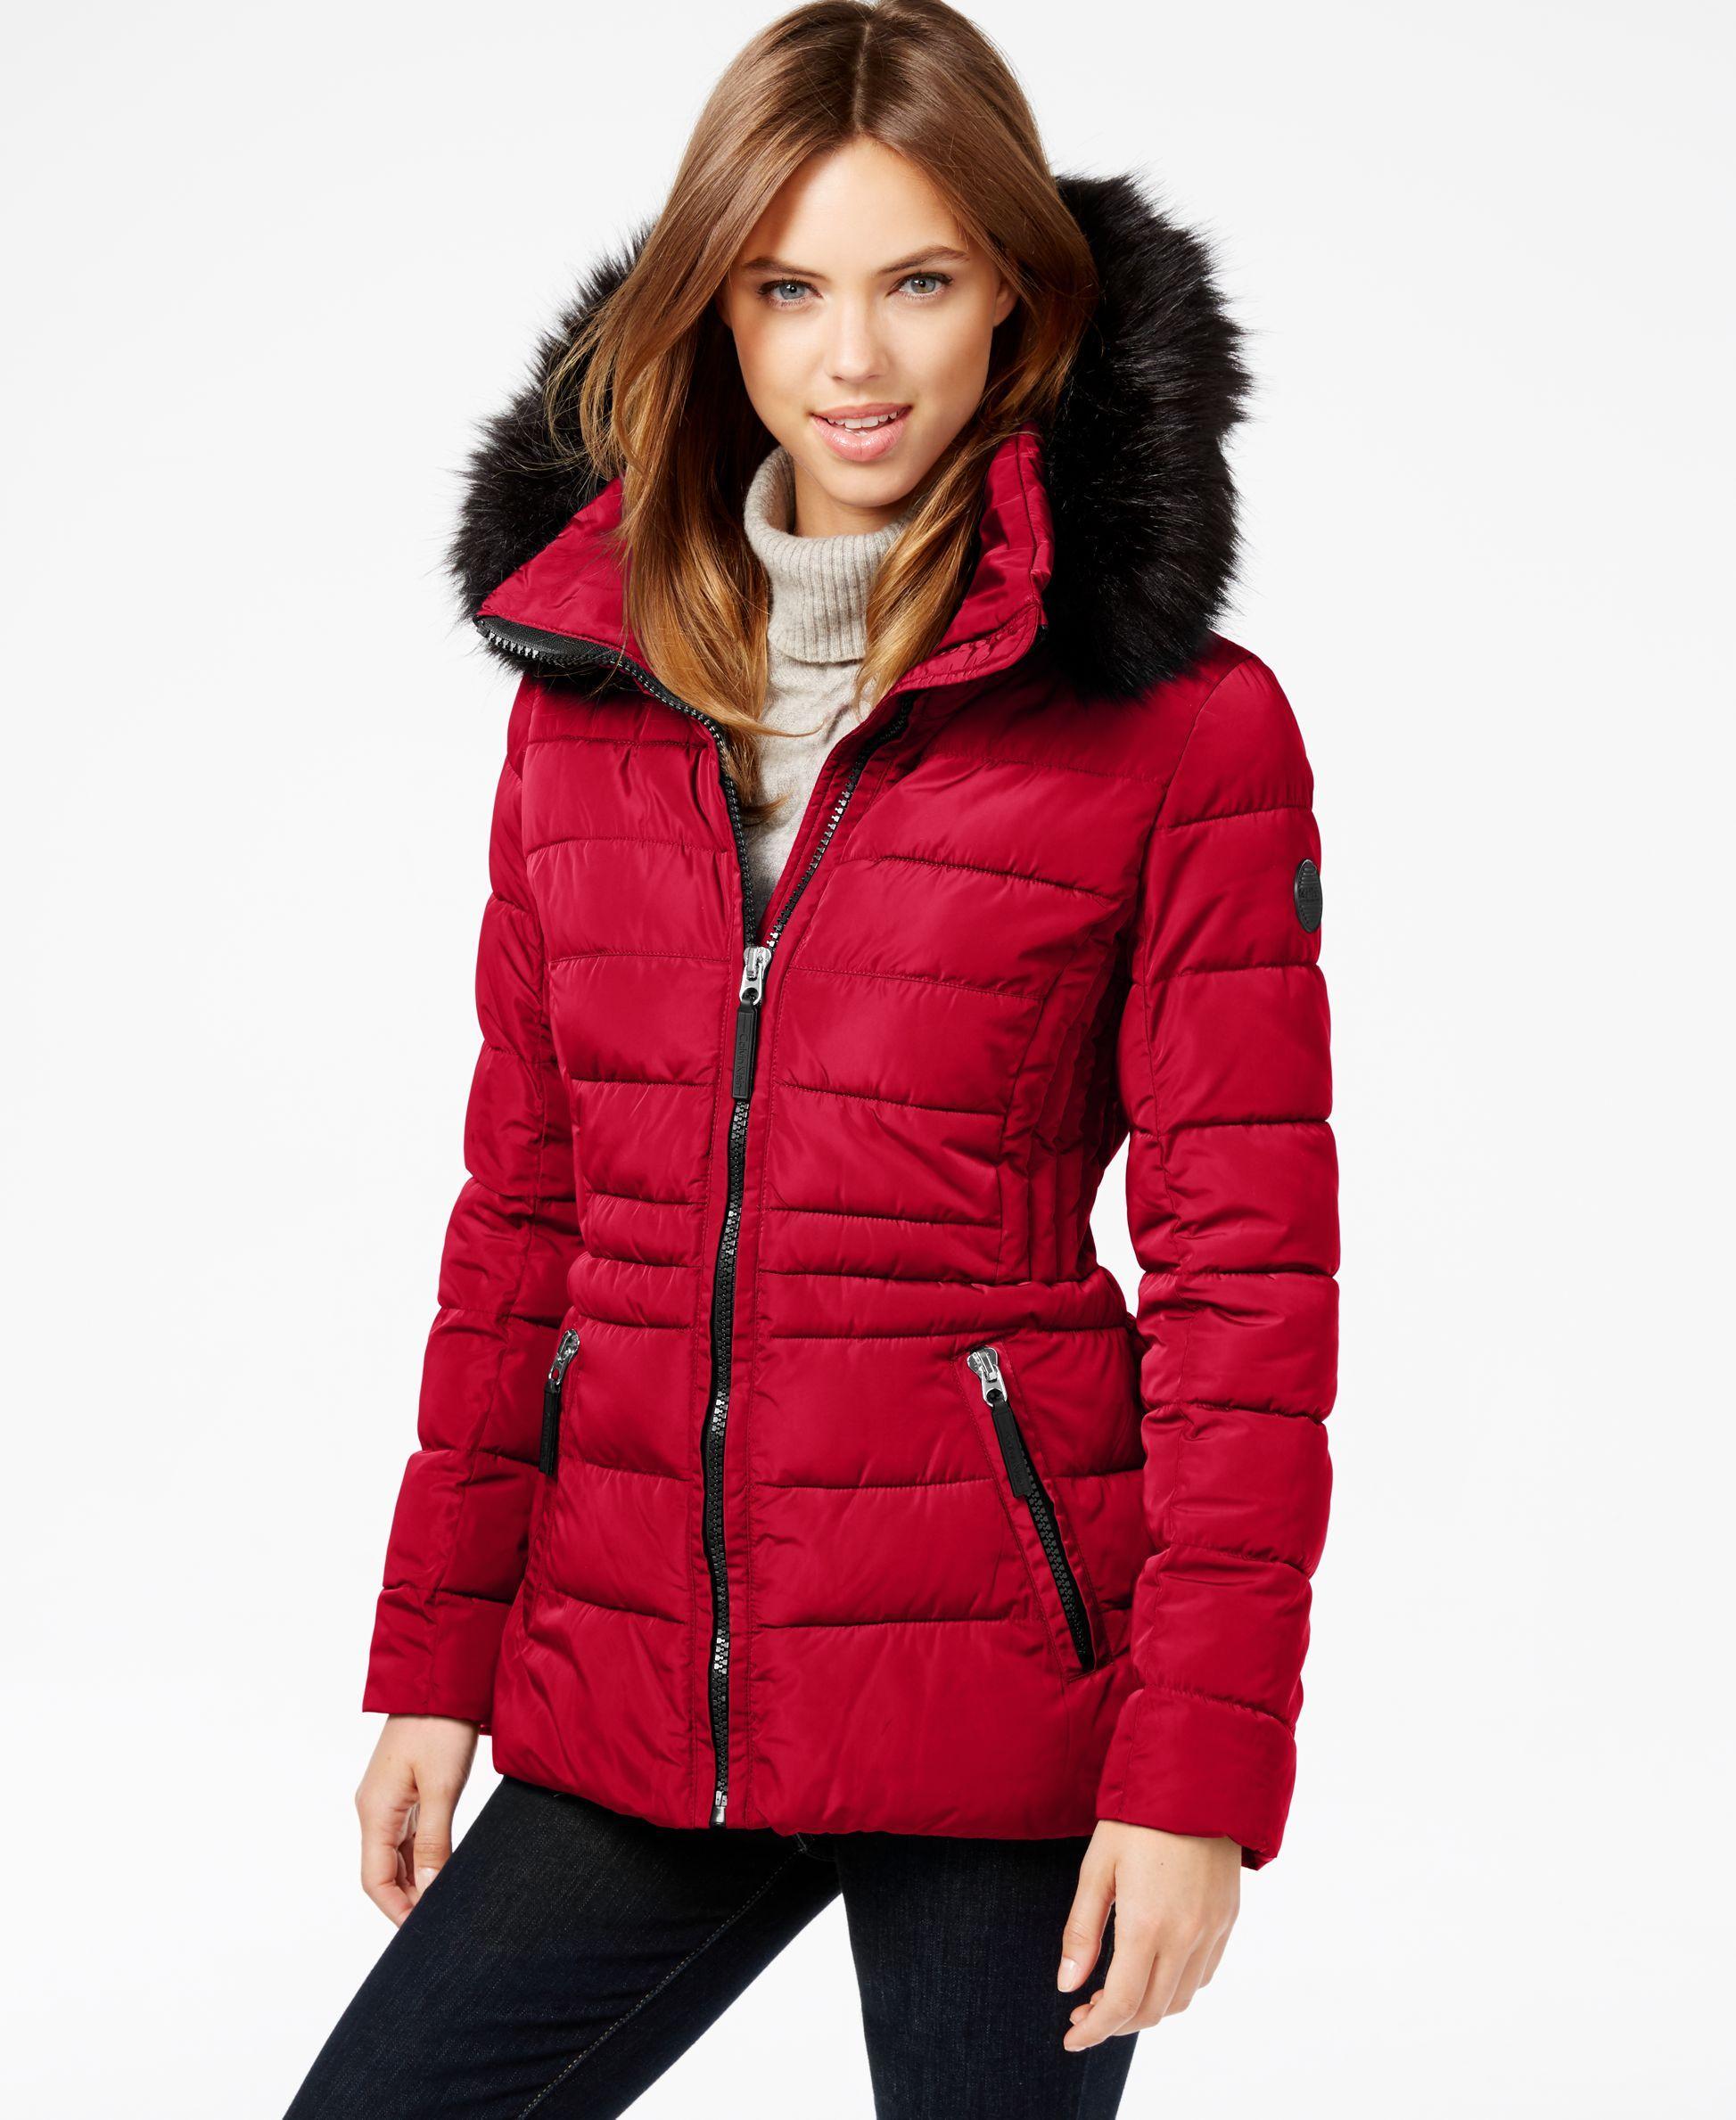 cc3a92de6 Calvin Klein Hooded Faux-Fur-Trim Quilted Puffer Coat | Downjacket ...